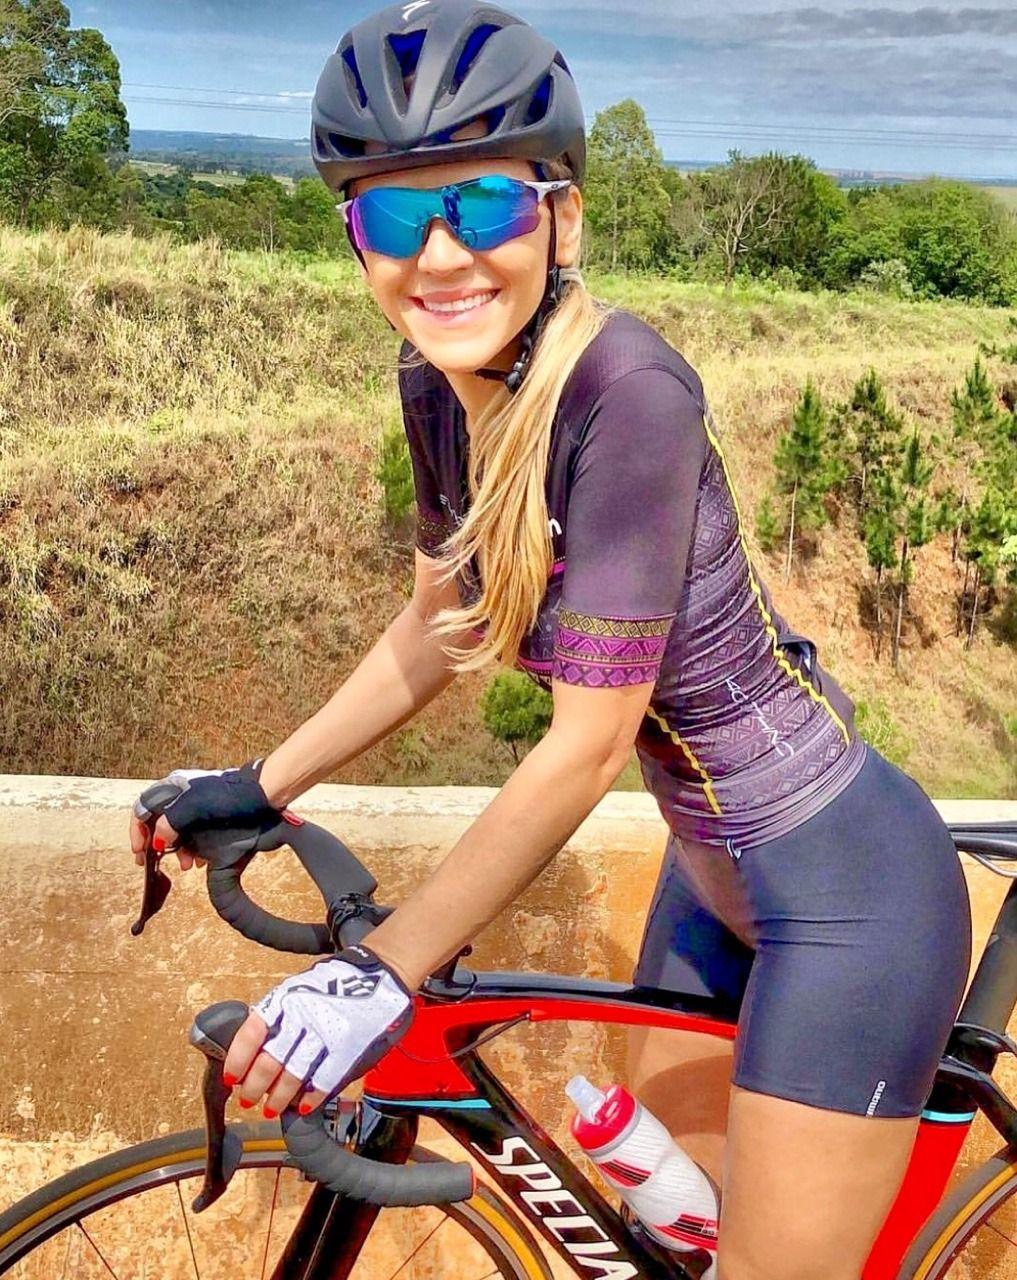 Najlepsze obrazy na tablicy Kobiety na rowerach (114